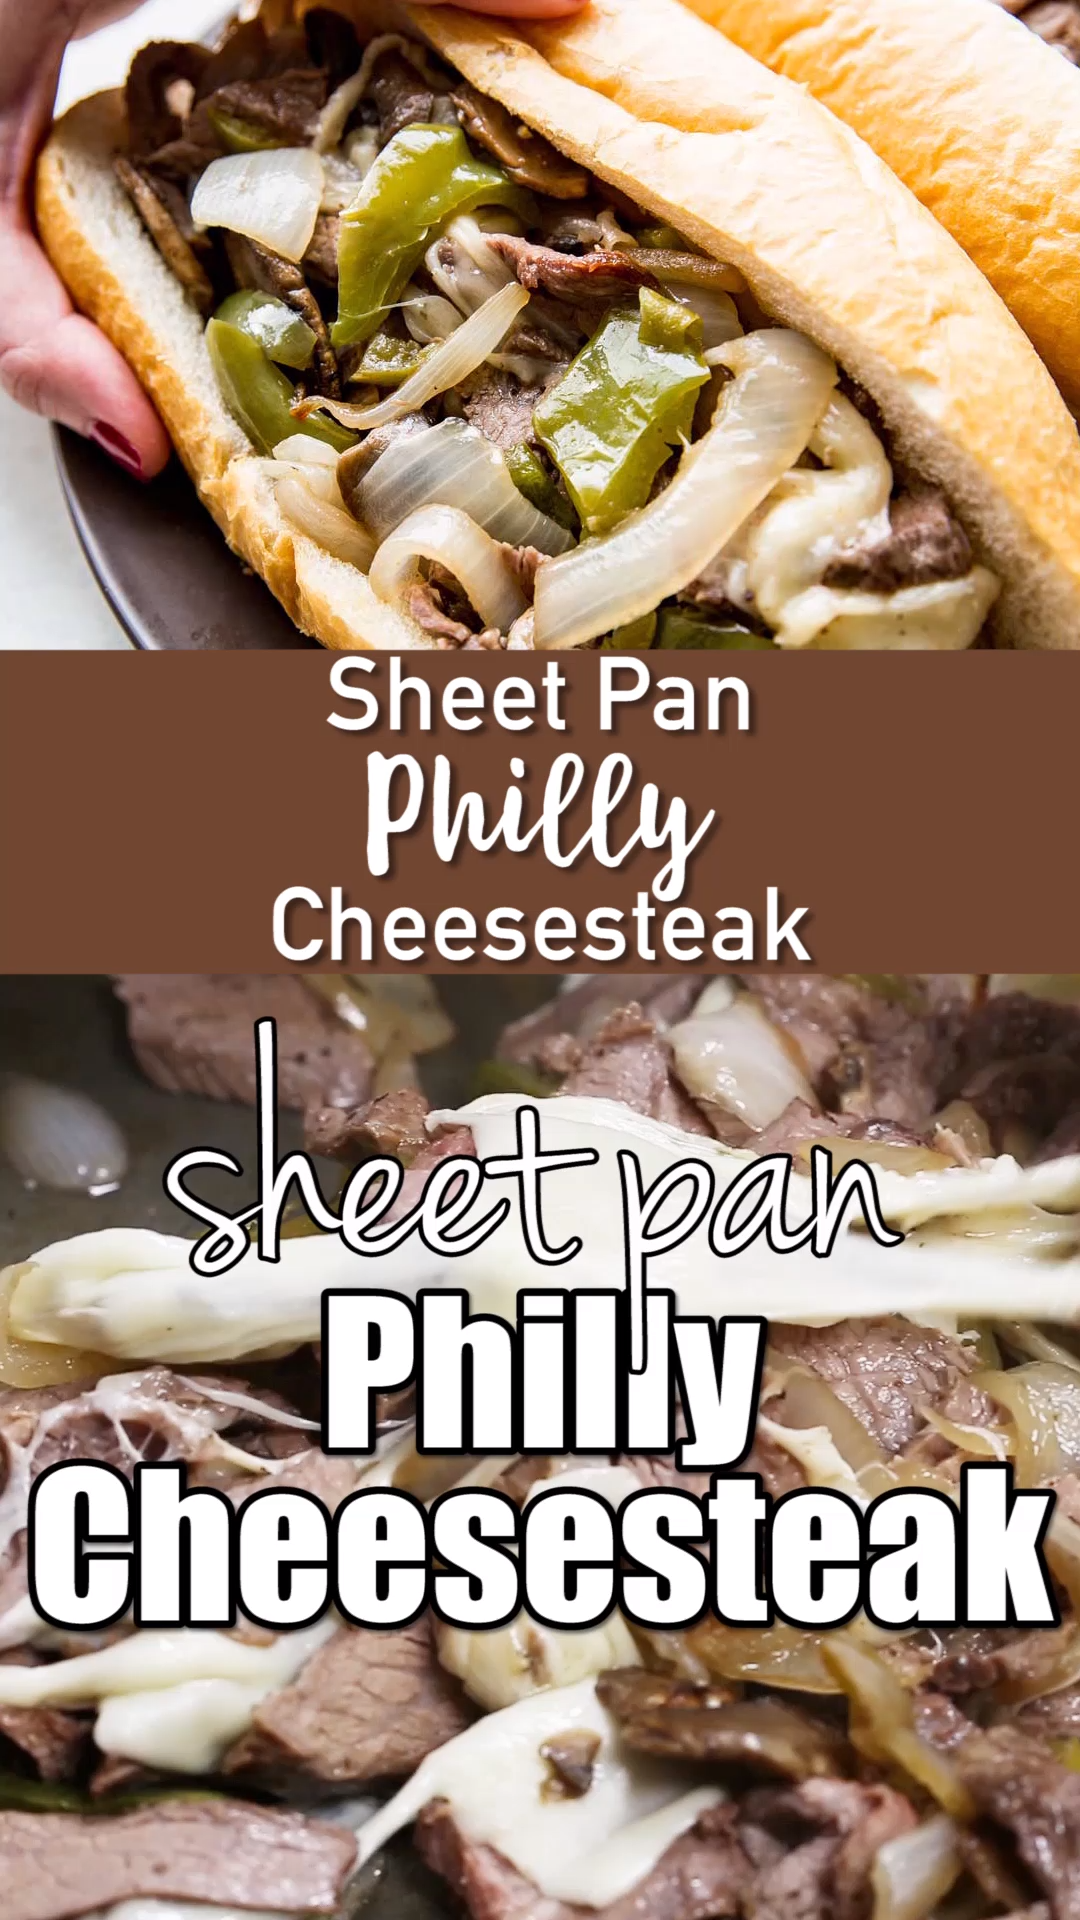 Sheet Pan Philly Cheesesteak